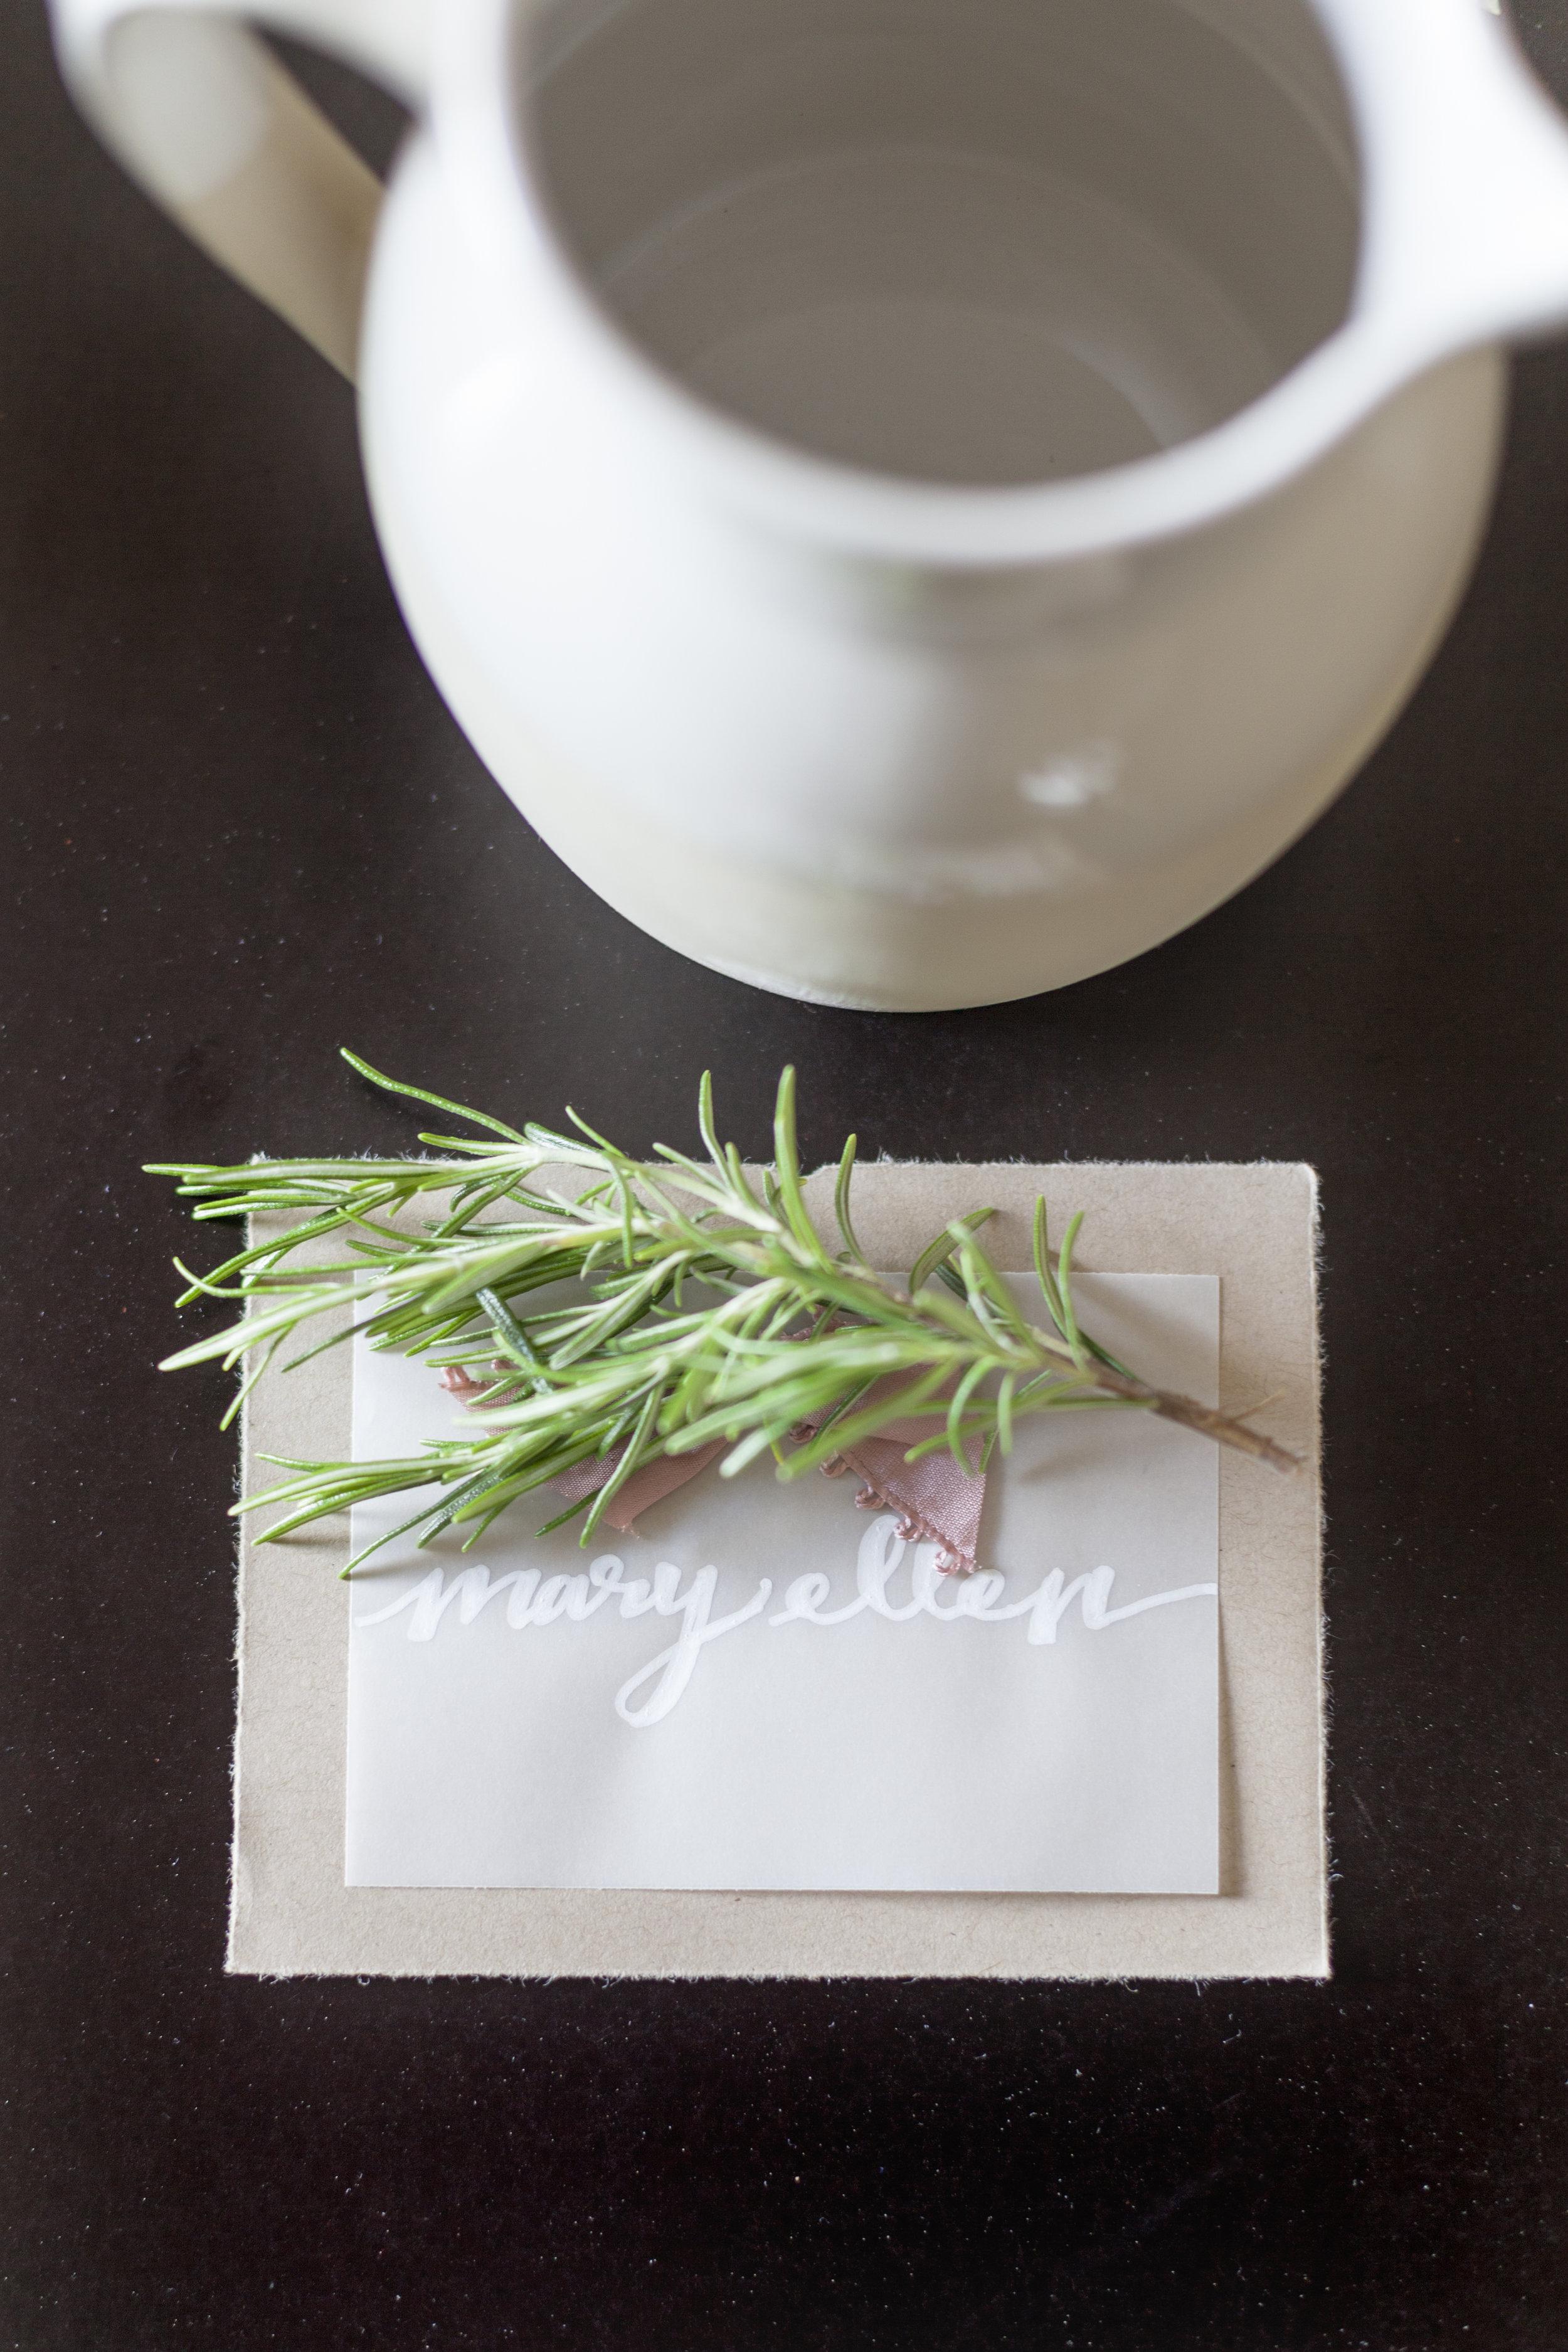 france-provence-floral-workshop-sandra-sigman-sharon-santoni (30).jpg